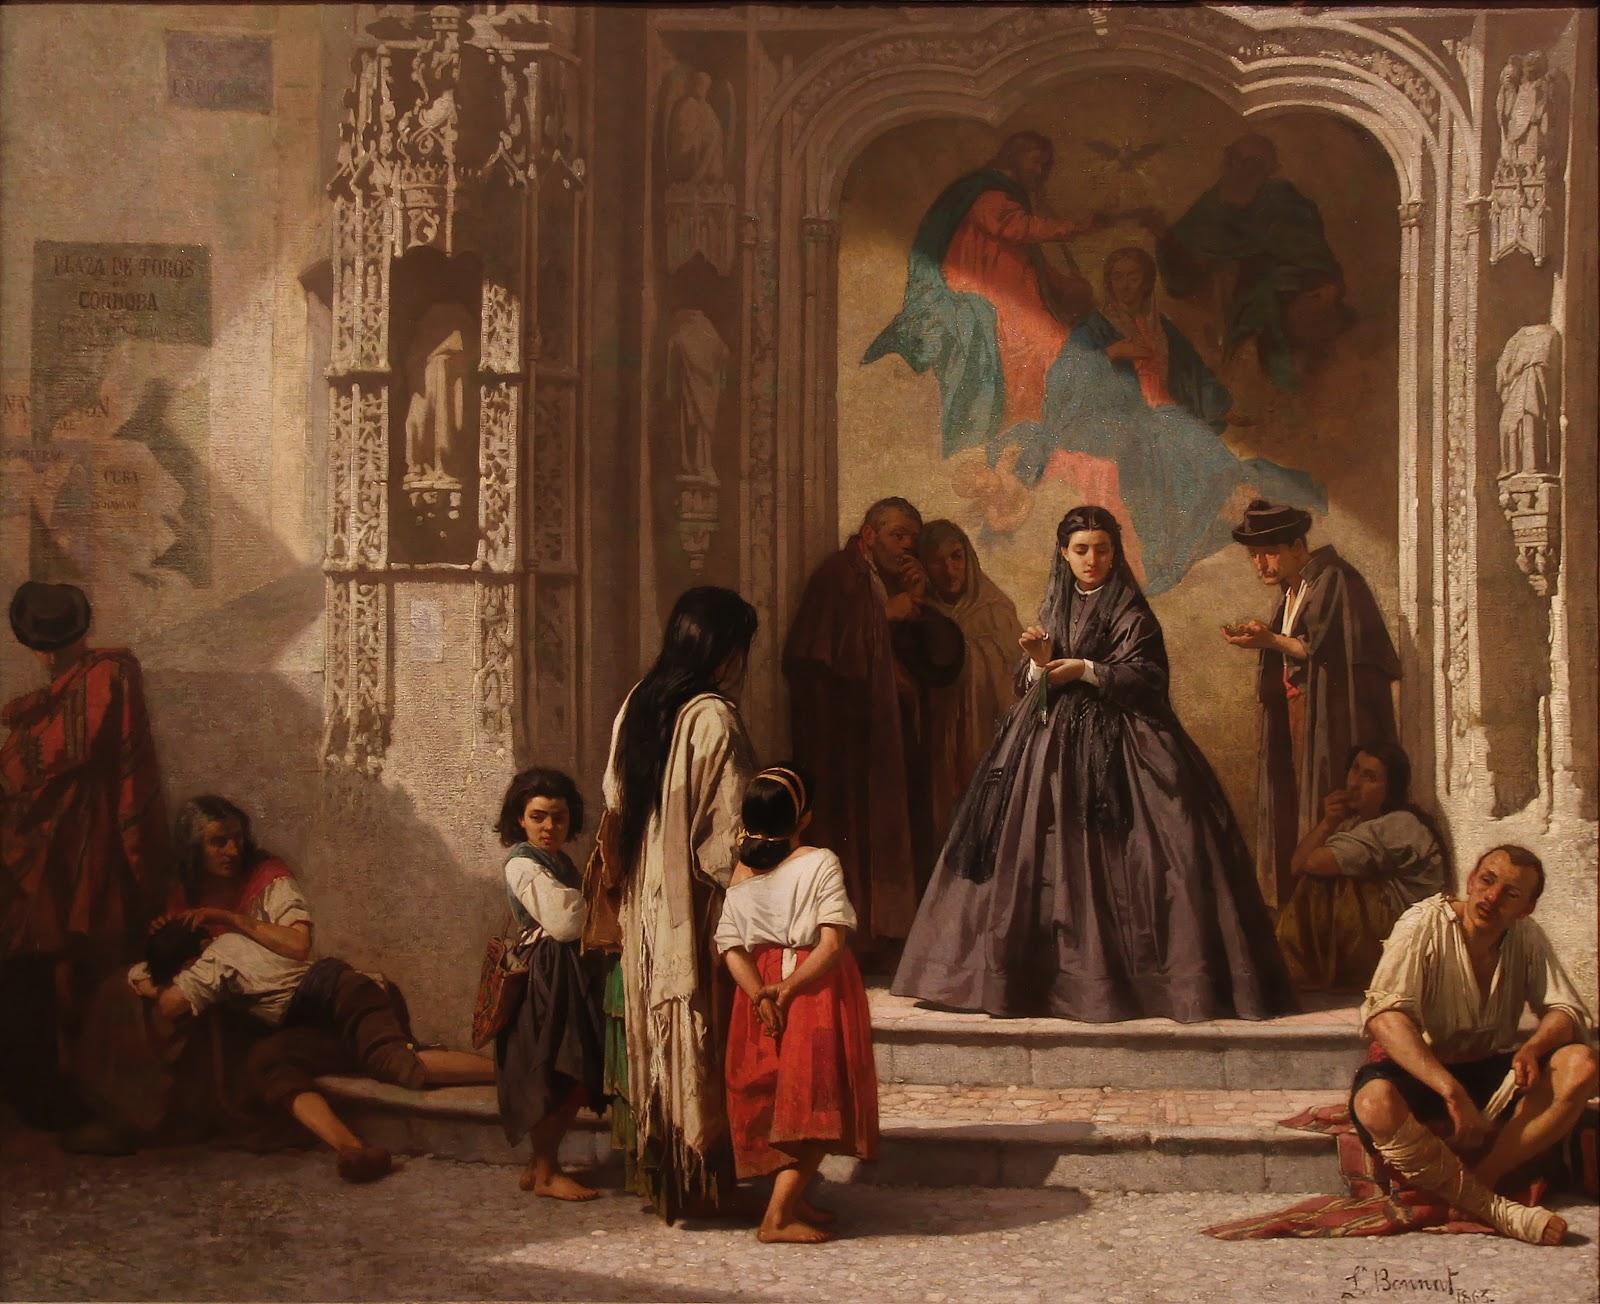 Leon  onnat Jeune femme faisant la charite a l entree de la chapelle de l hopital San Sebastian a Cordoue Musee Goya